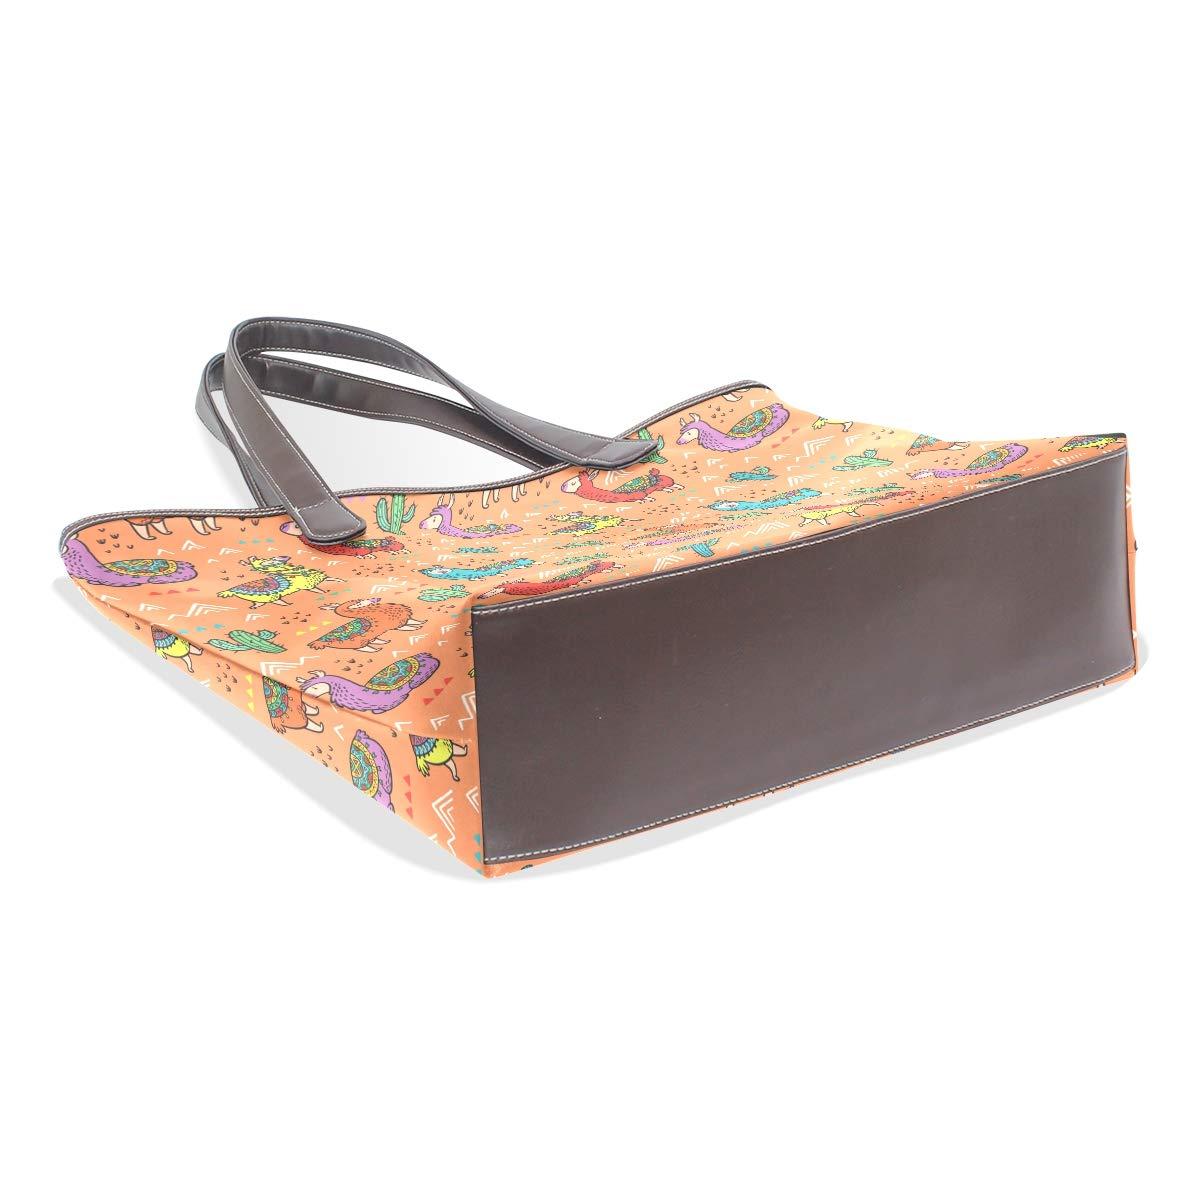 Womens Leather Alpaca And Cactuses Orange Handbag Satchel Tote Bag Tote Purse